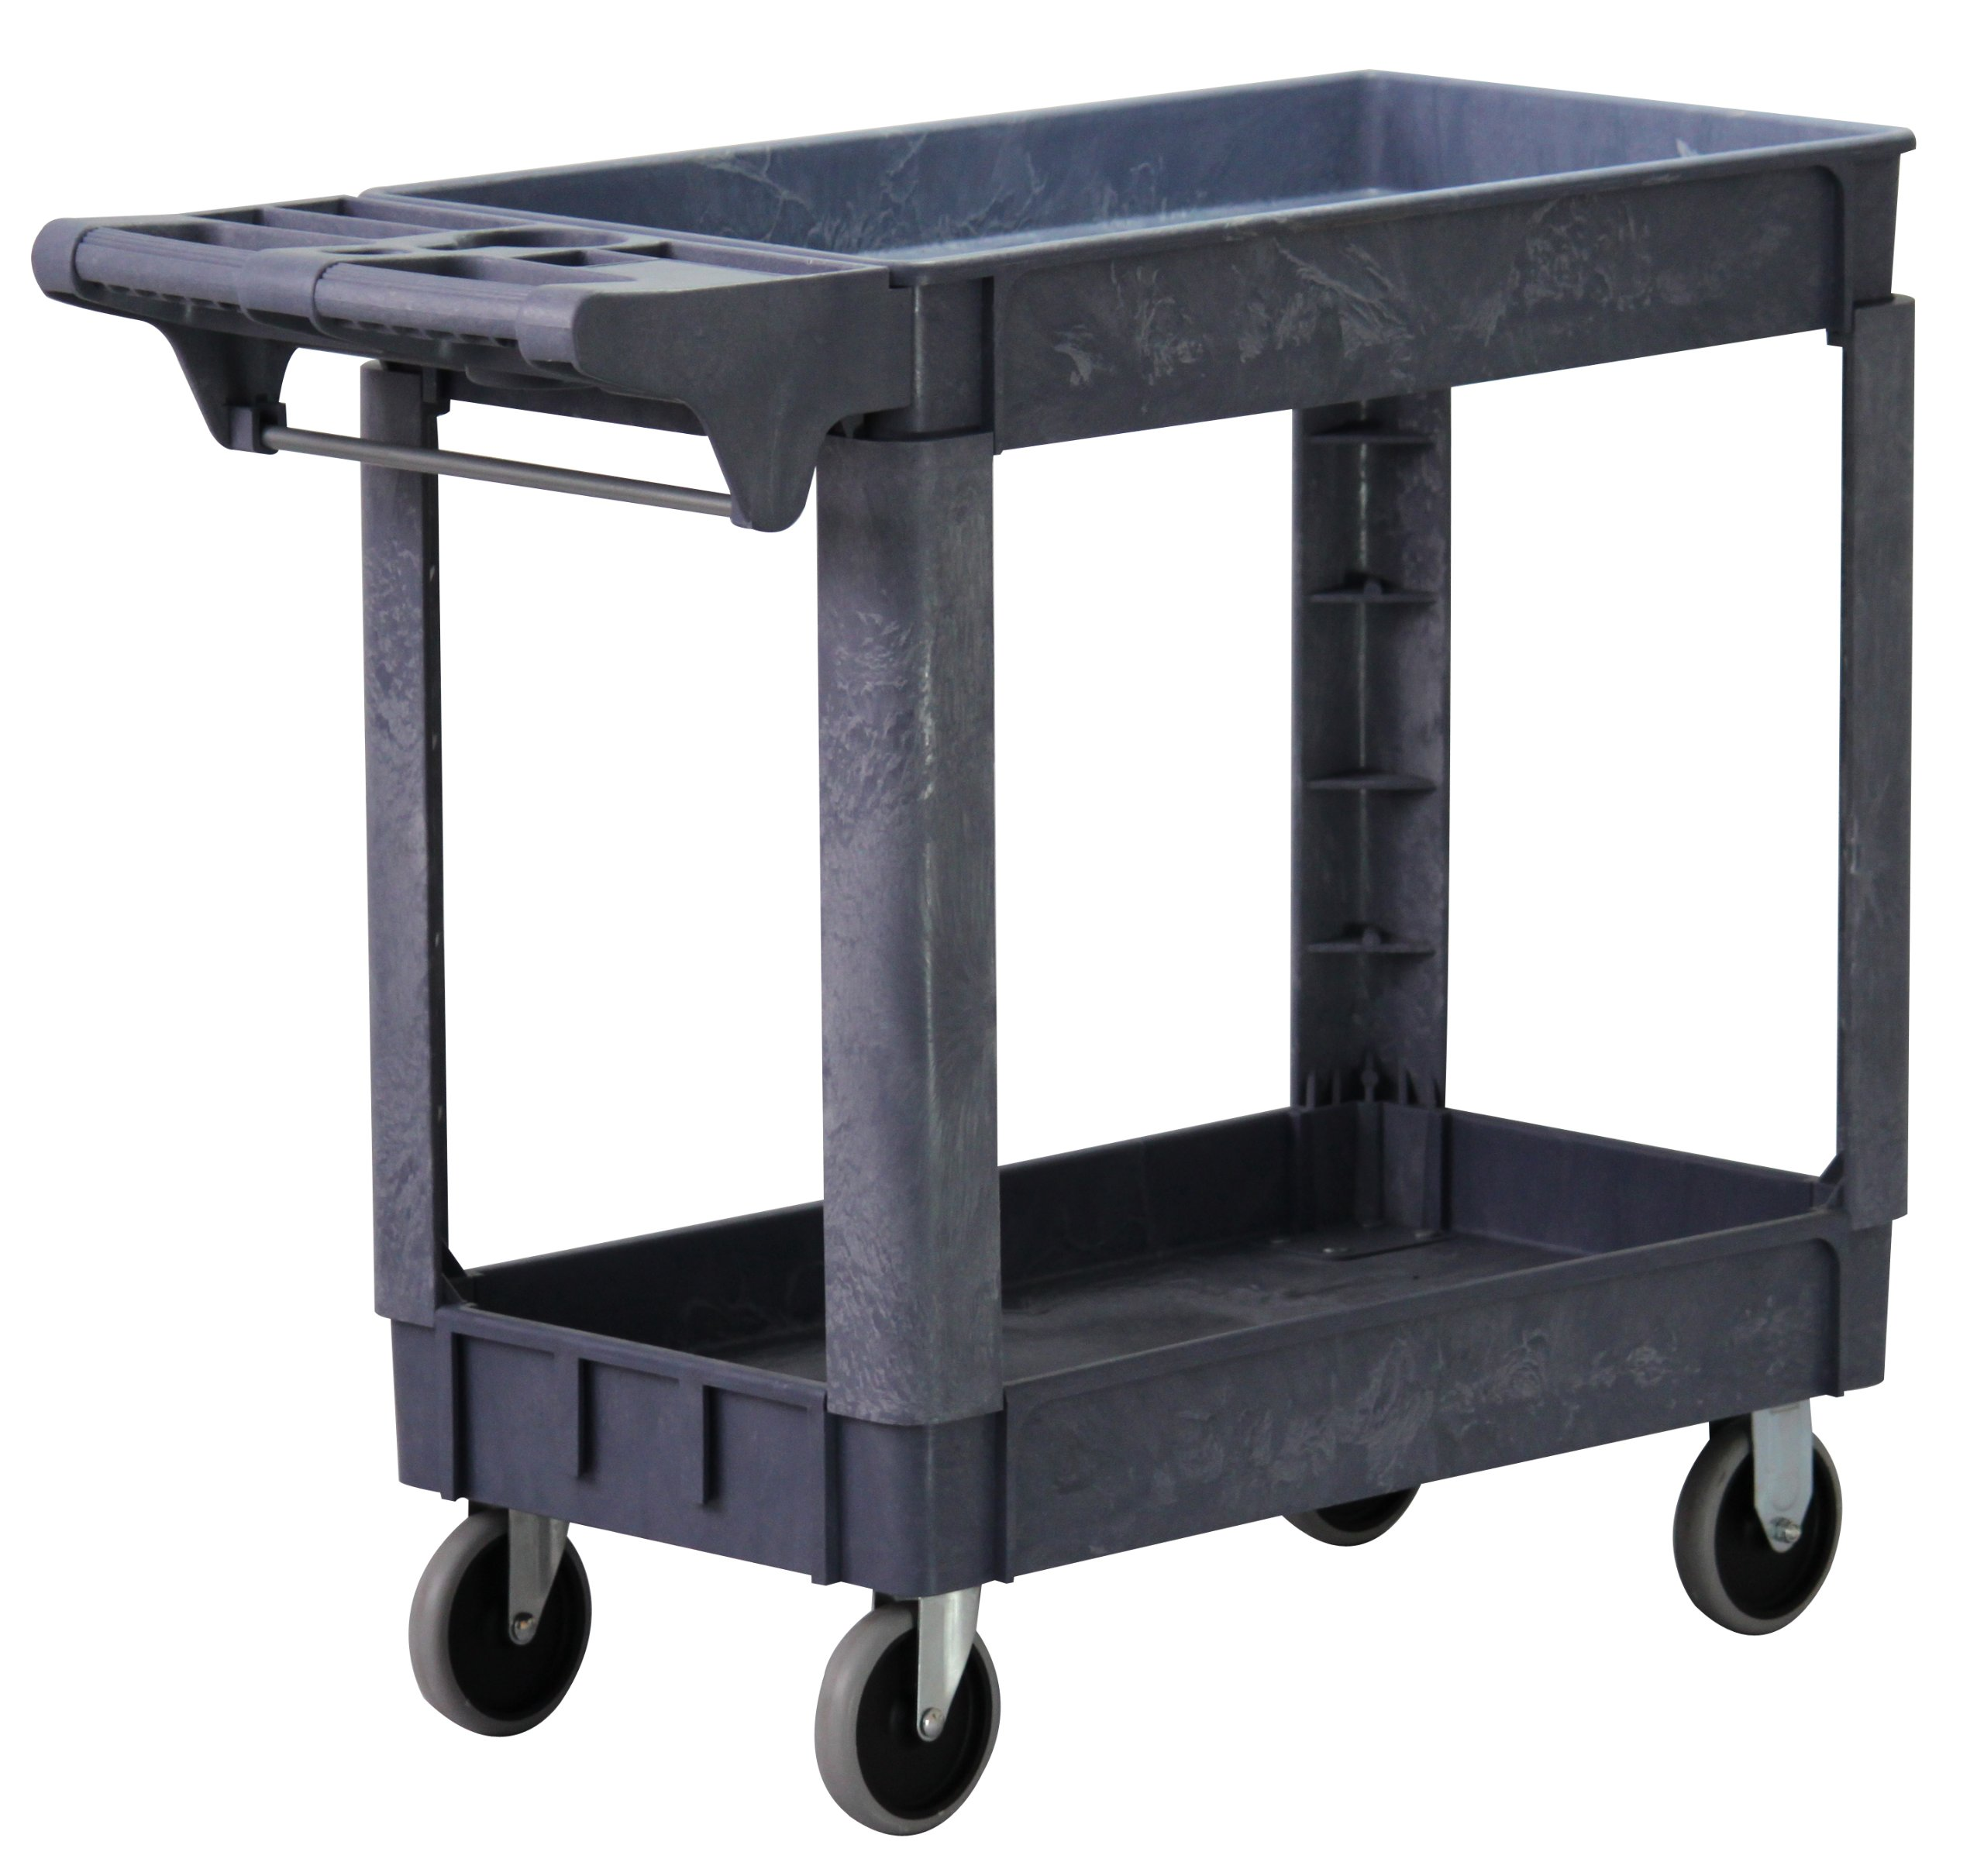 steel cu tools atv best trailer shop ohio product cart ft garden capacity lb model